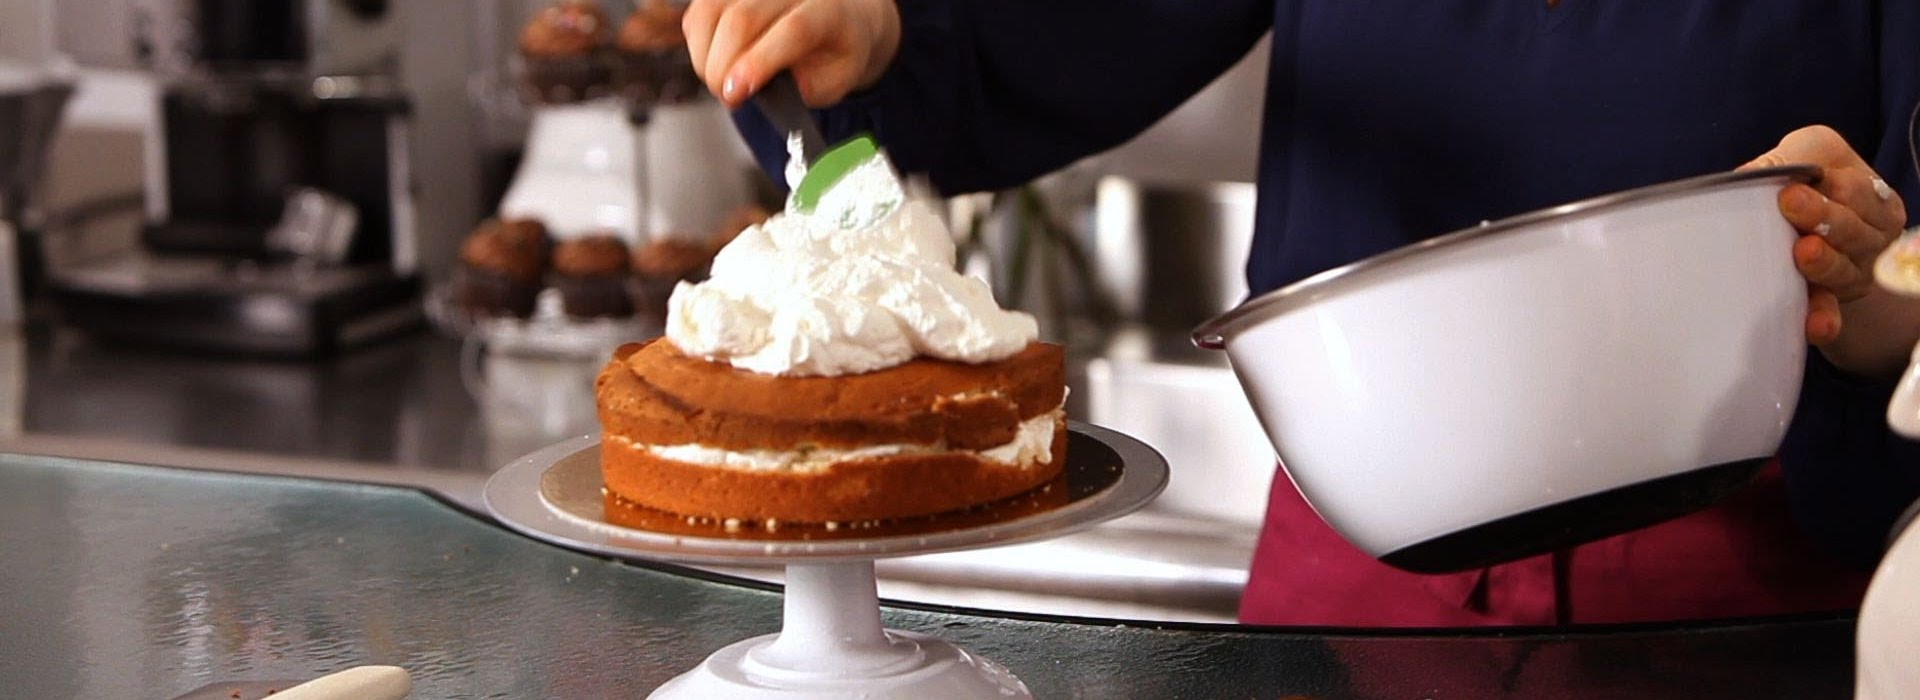 cake decorating chattanooga tn